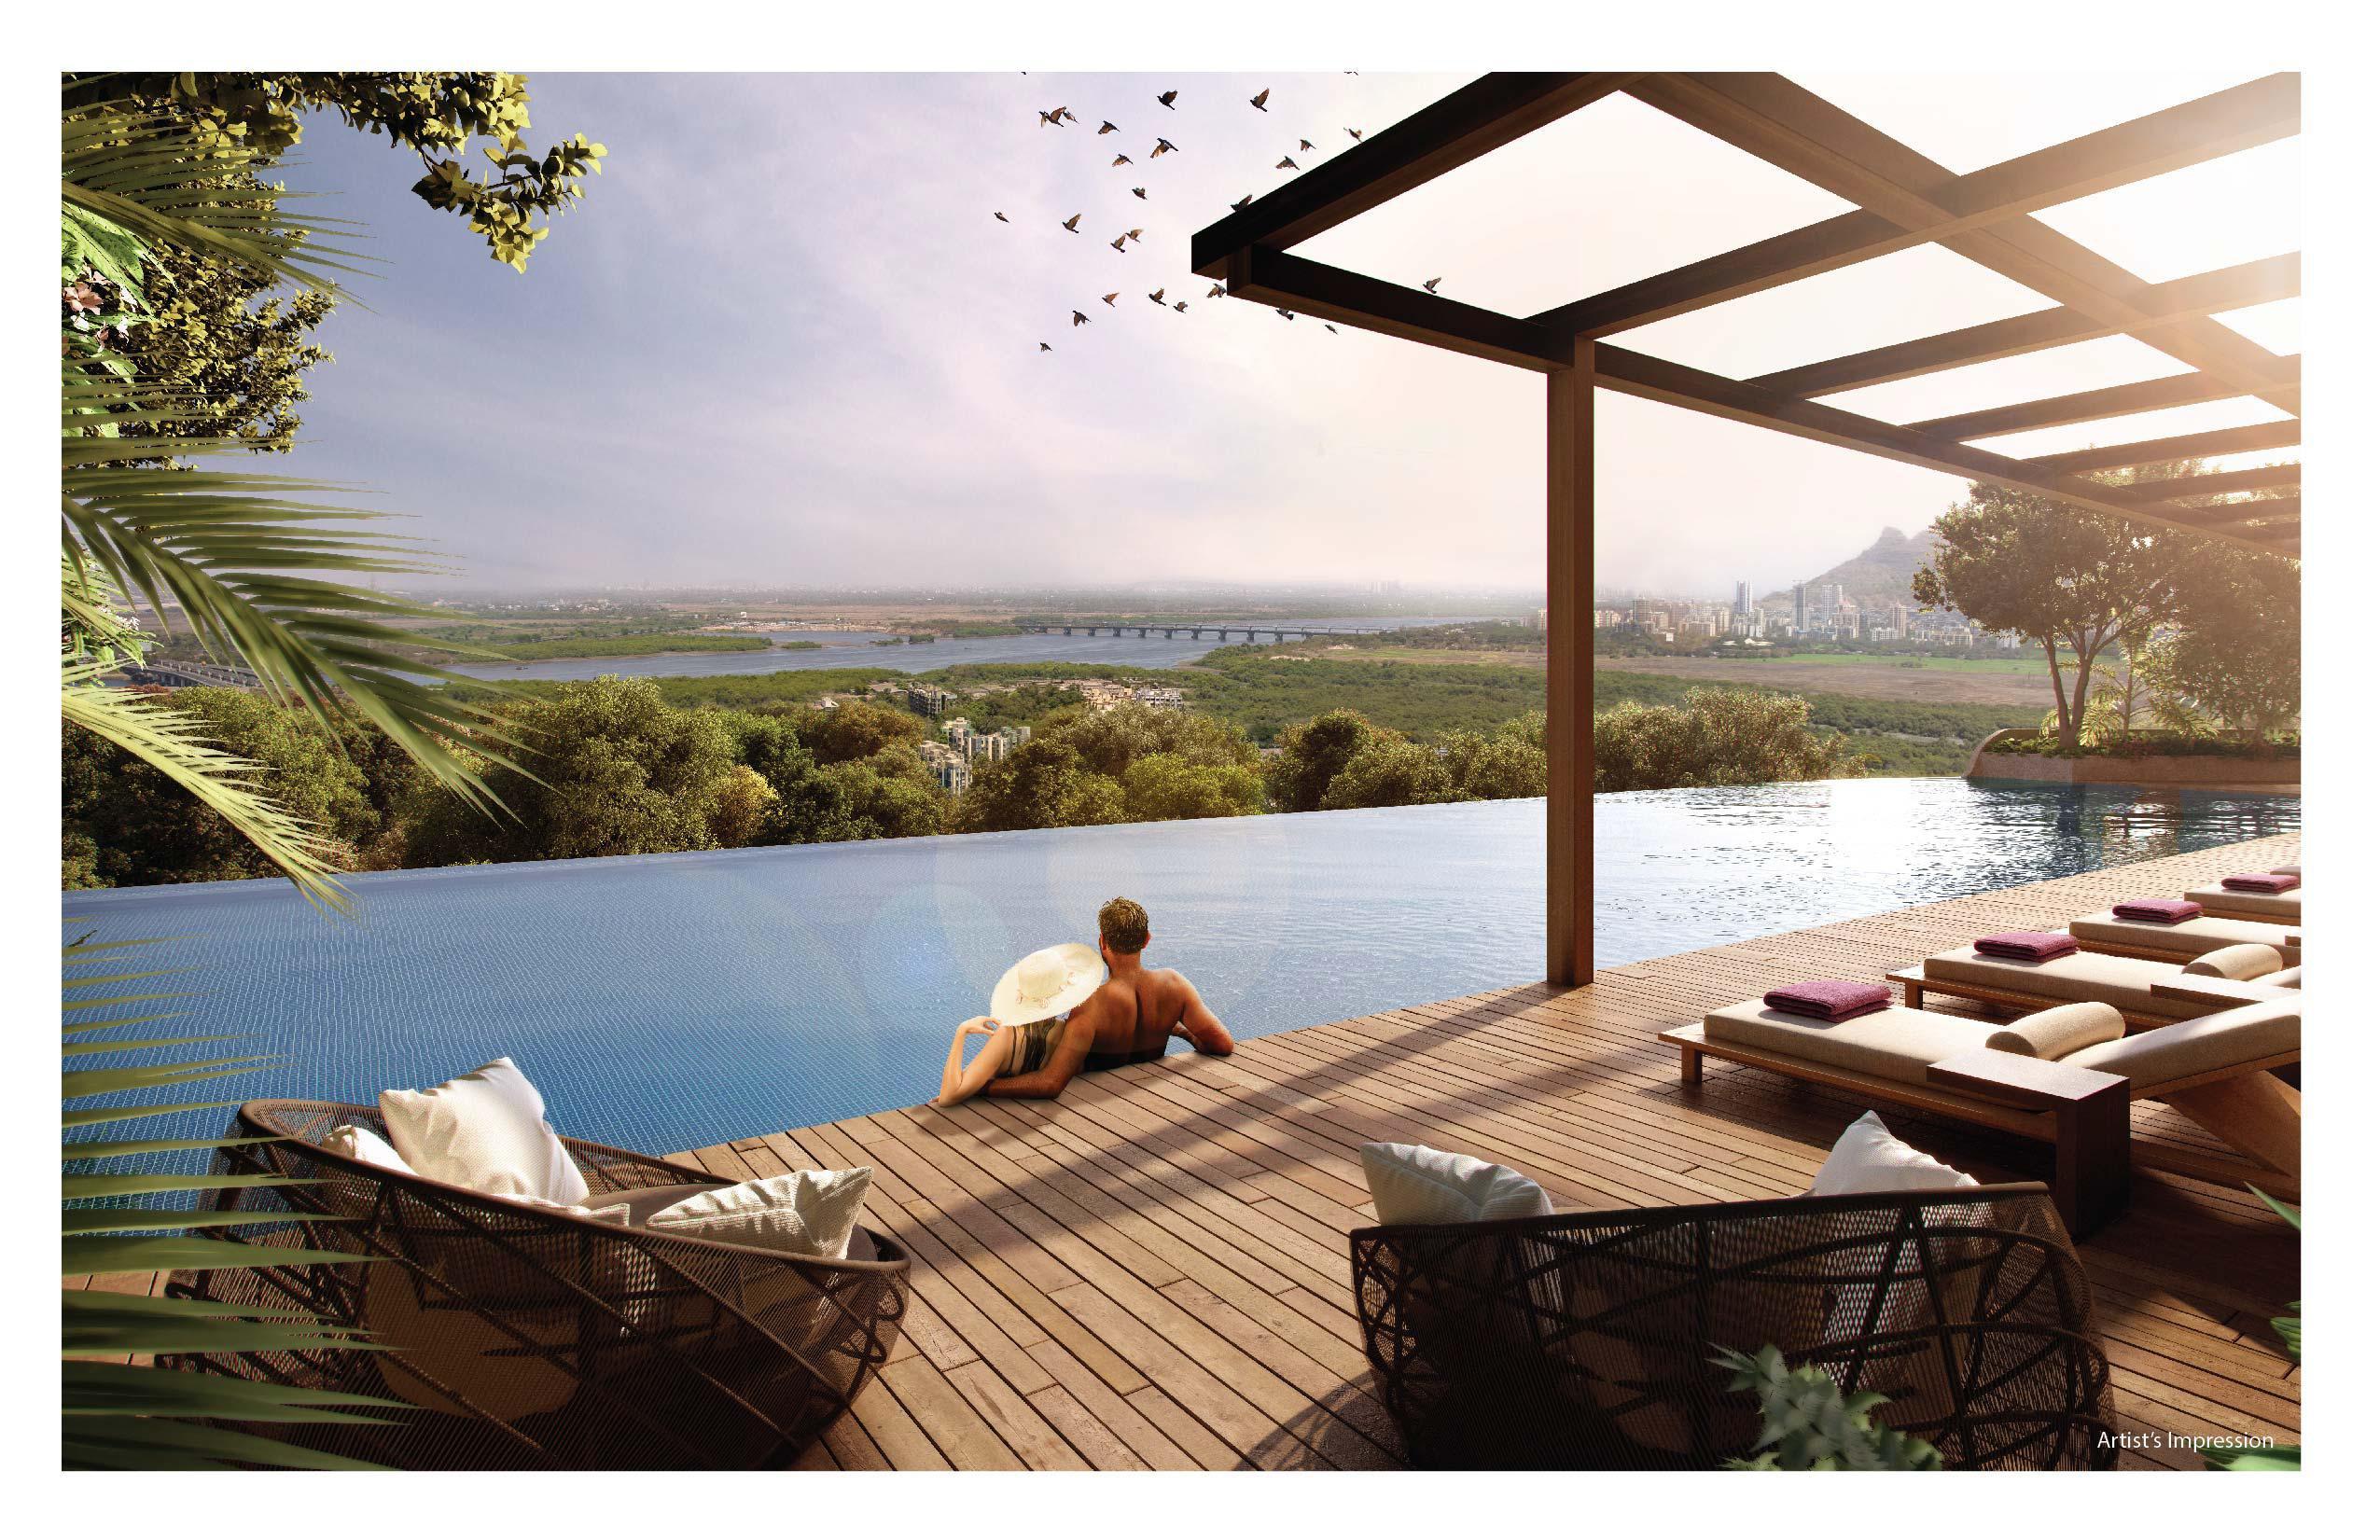 piramal vaikunth vairat amenities features8